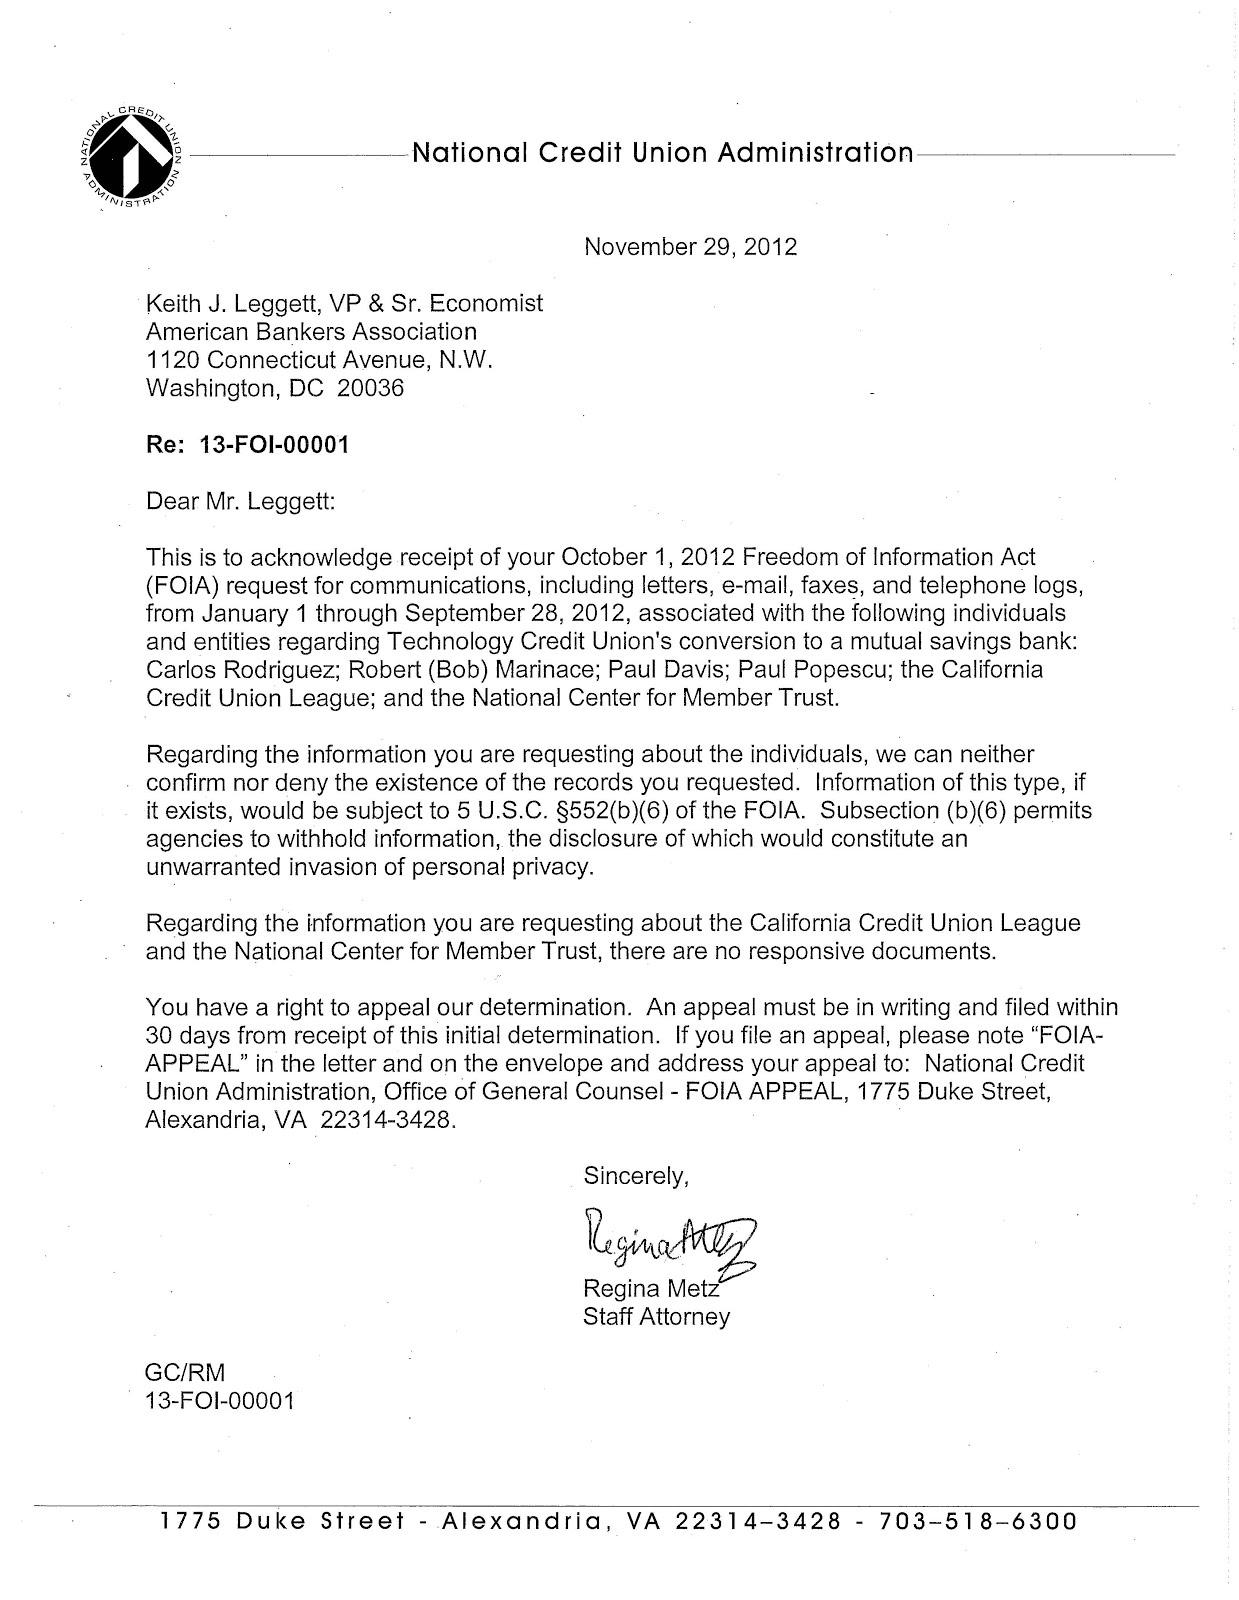 Keith Leggett's Credit Union Watch: NCUA's Denial Of FOIA